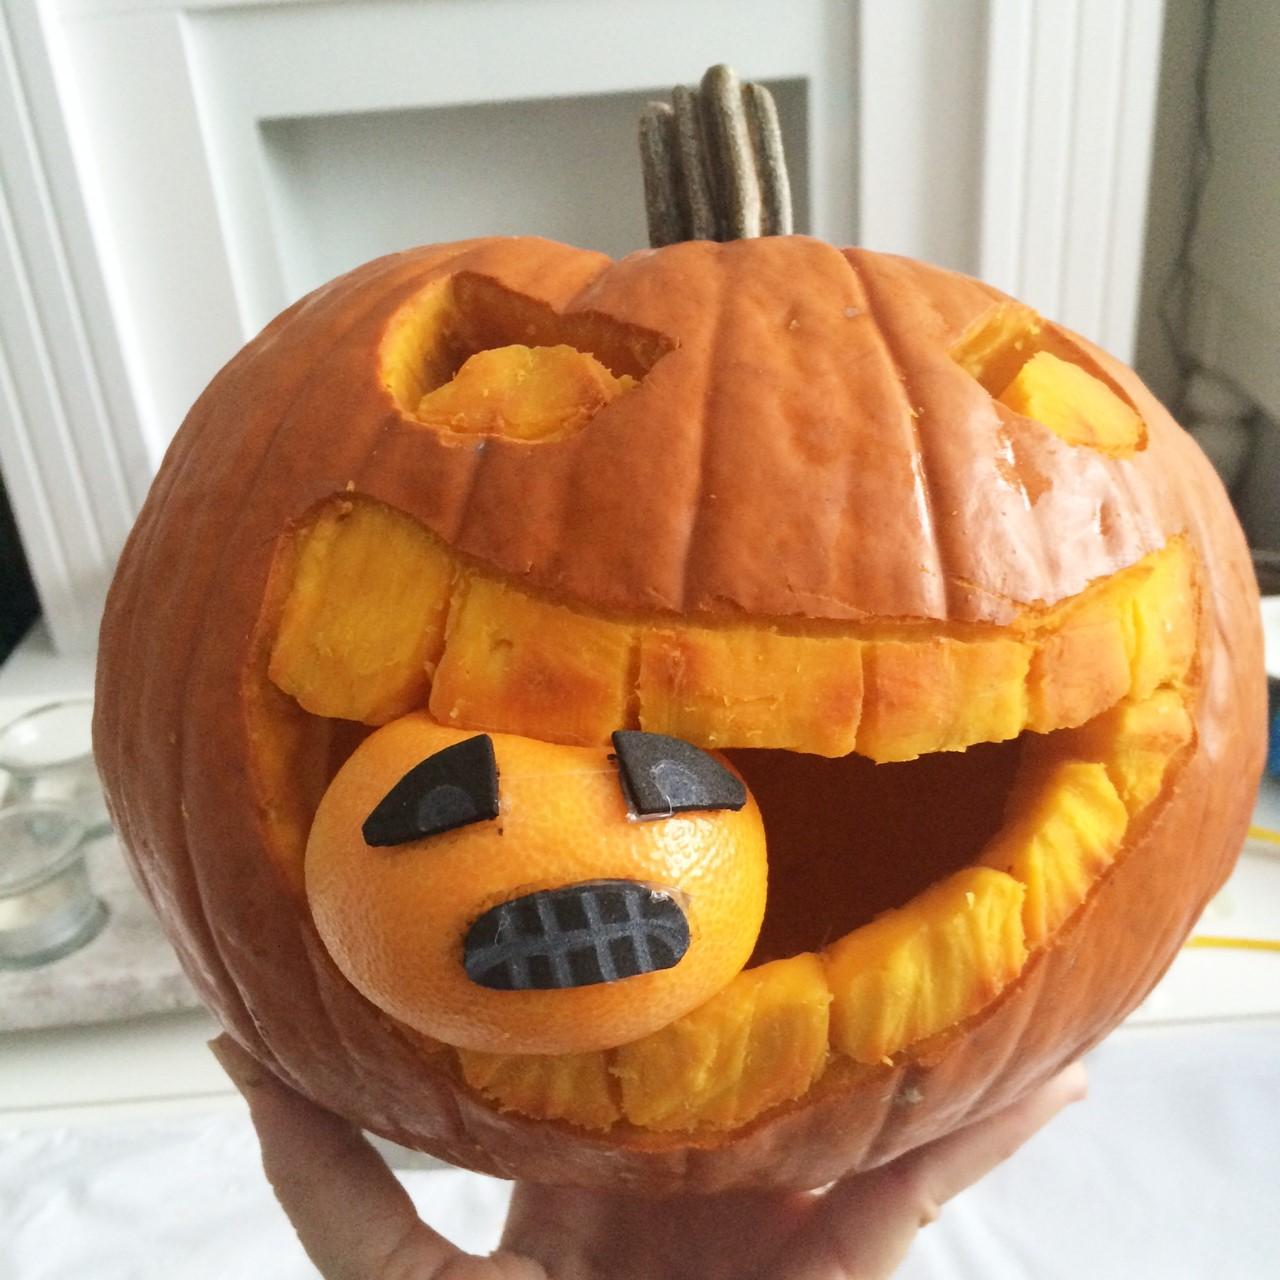 Cmo carvar una calabaza para Halloween S L O A N E S T R E E T